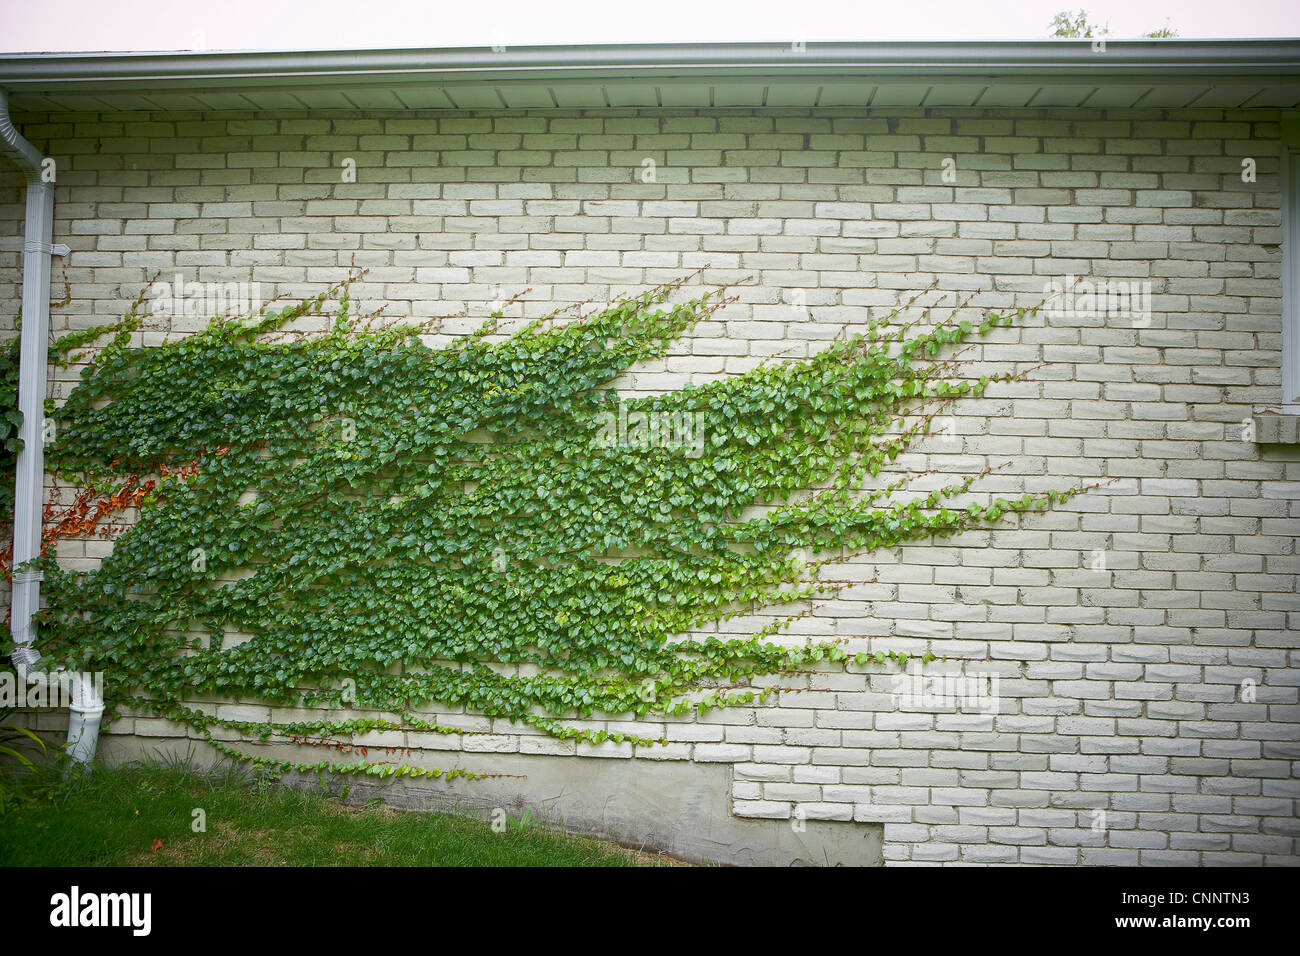 Efeu an der Mauer, Bradford, Ontario, Kanada Stockfoto